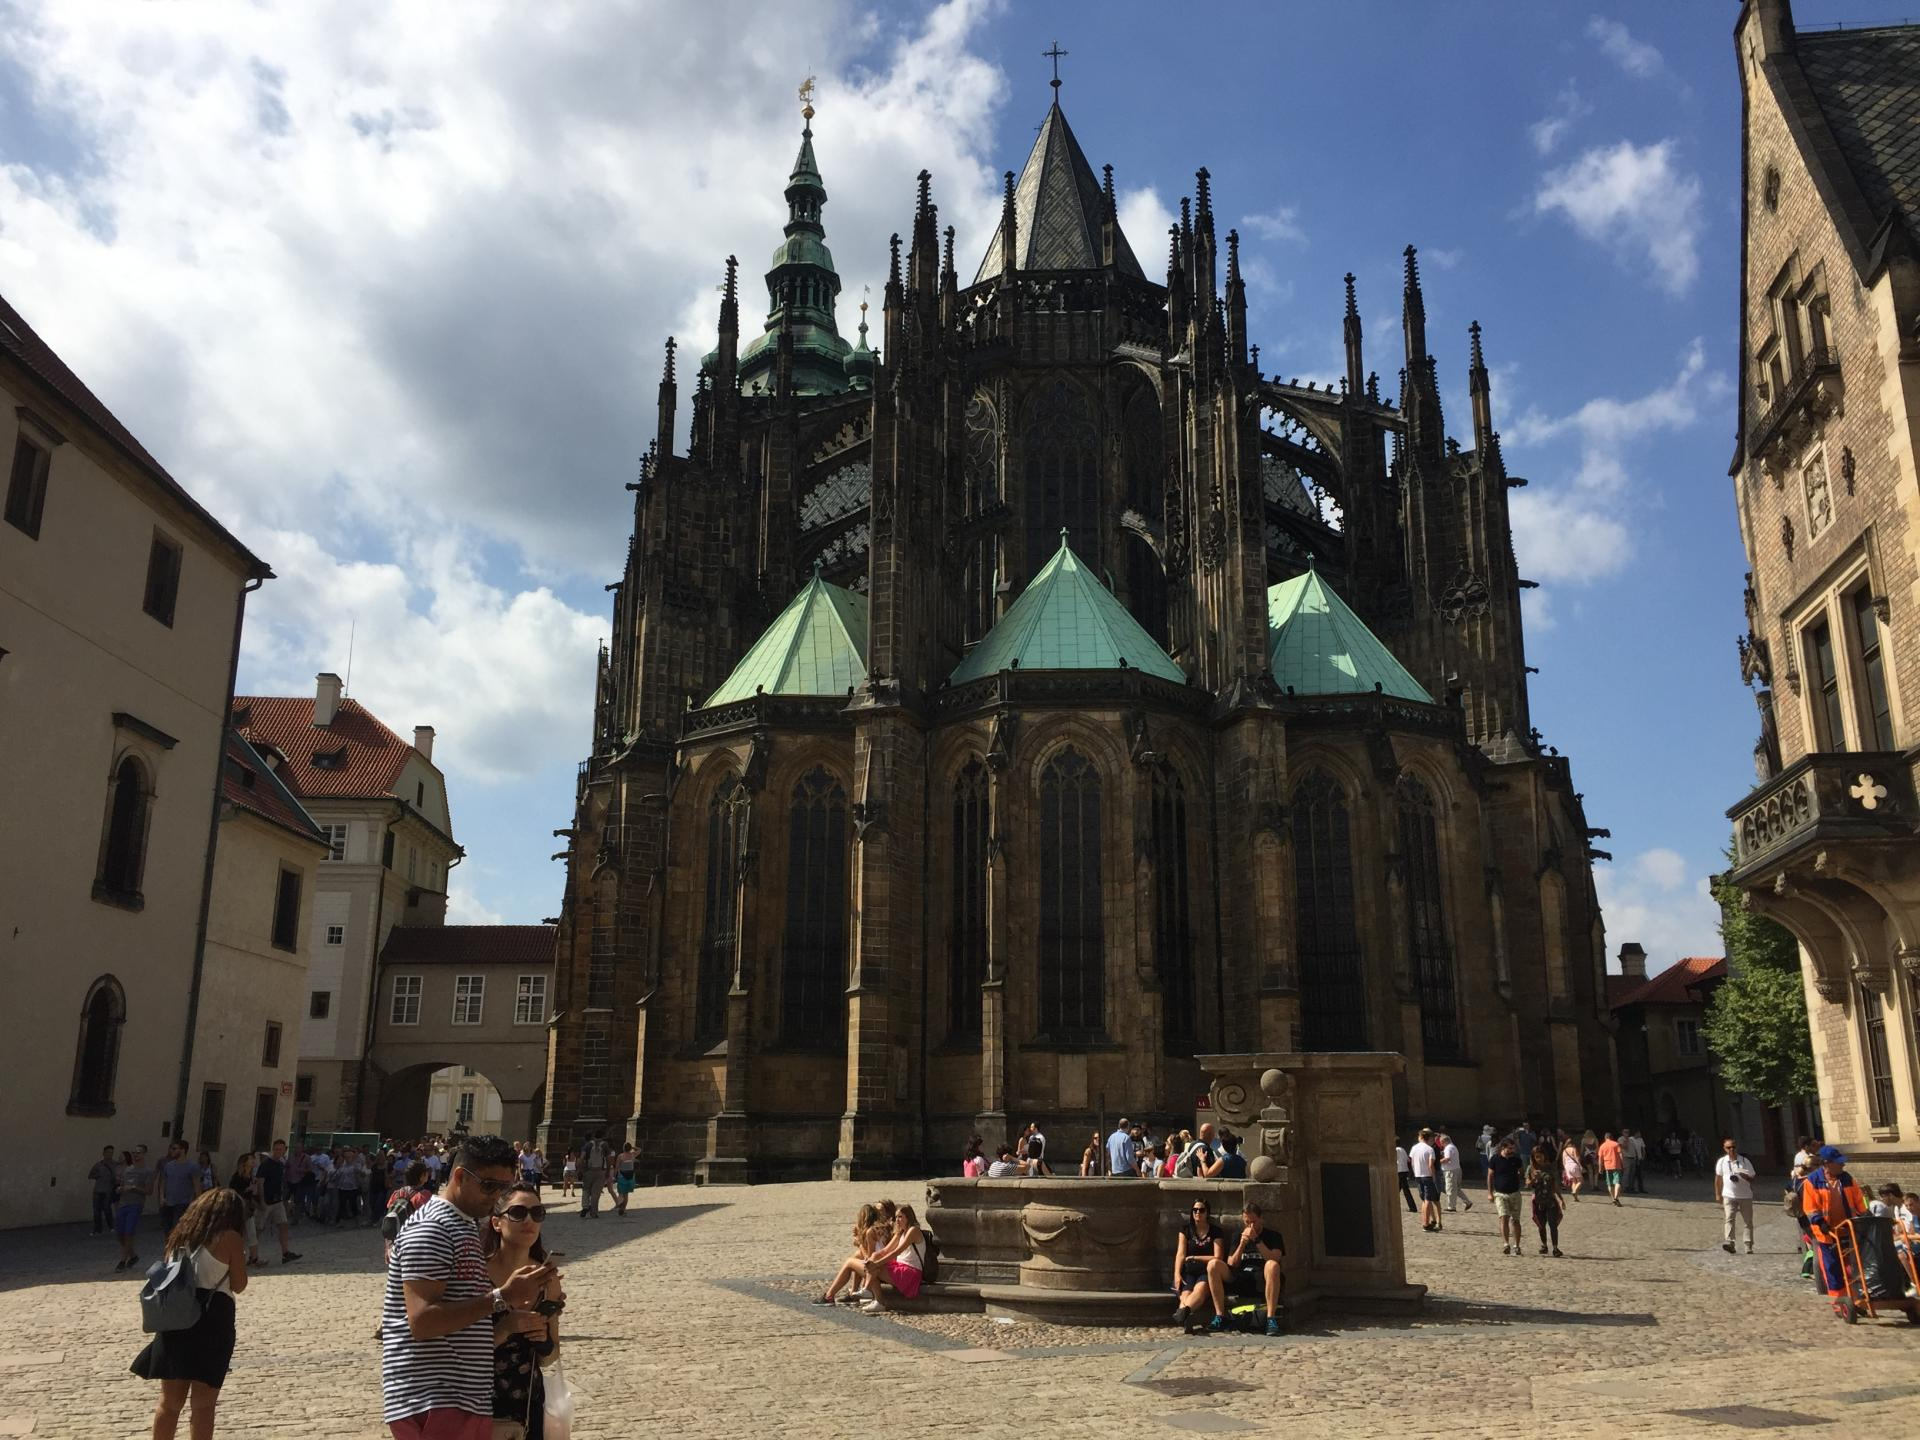 Pra cathedrale gothique